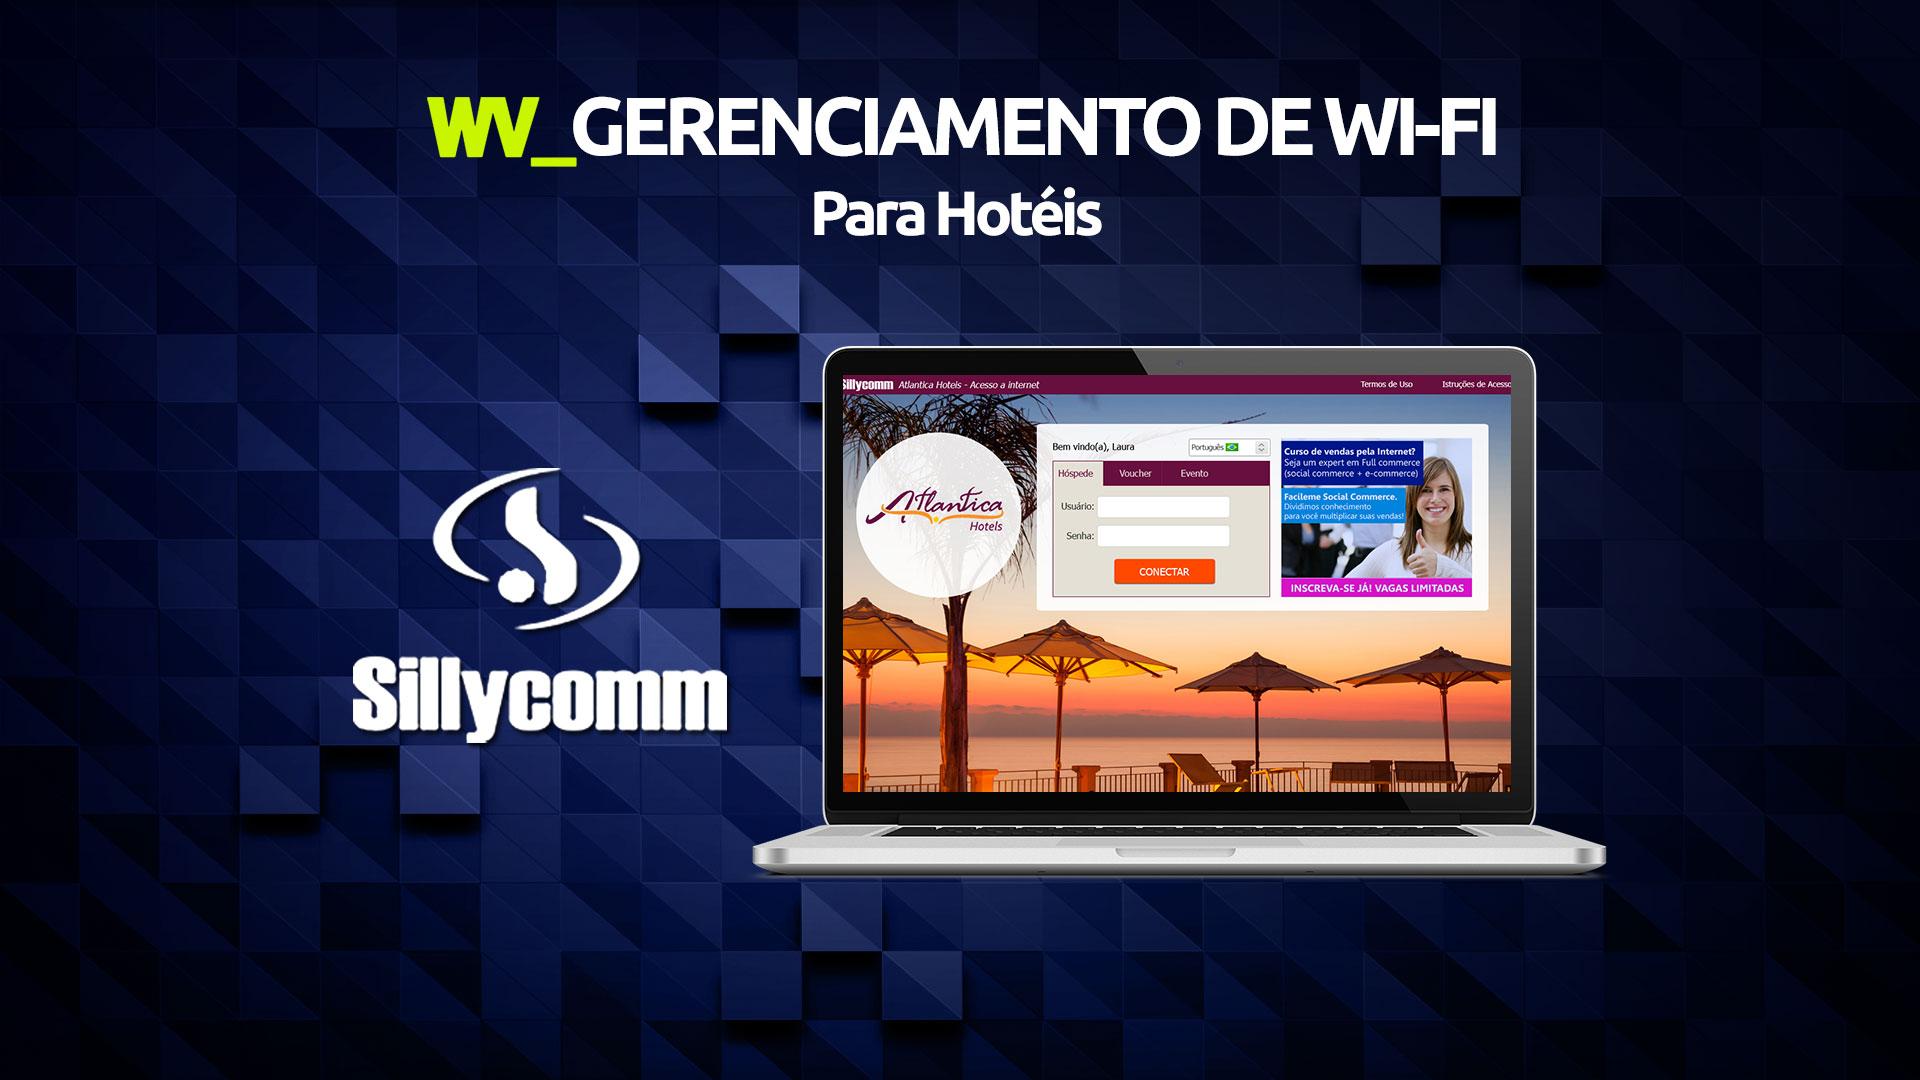 WV-Todoz-Gerenciamento-de-Wi-Fi-Sillycomm